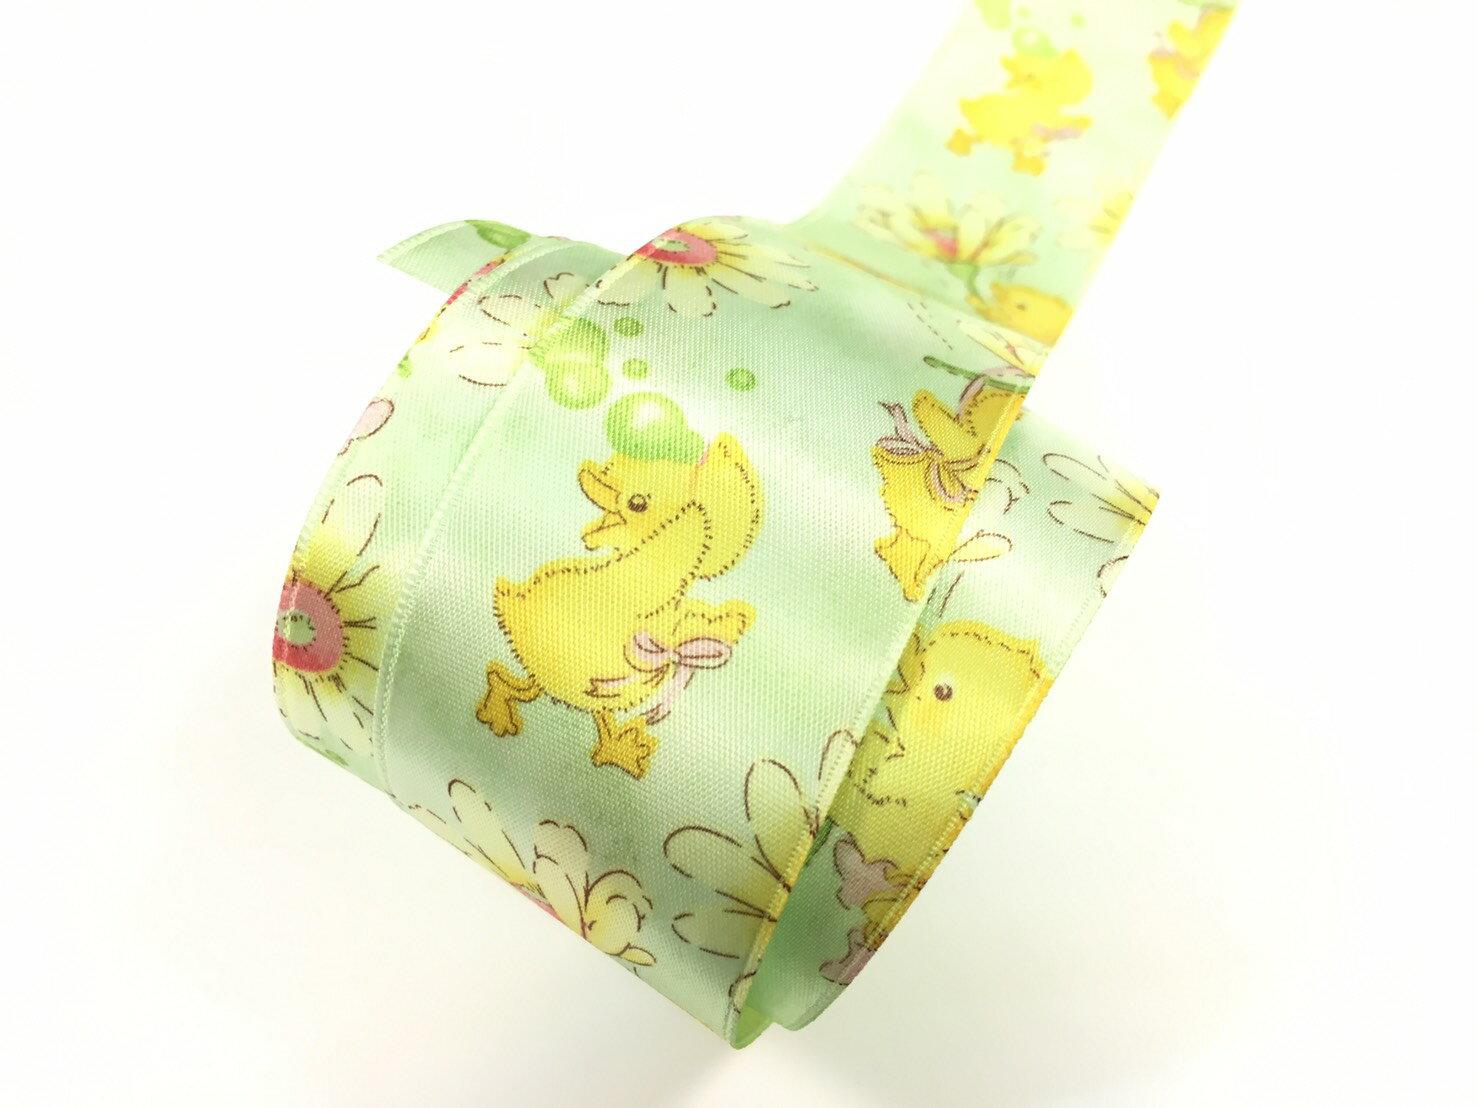 【Crystal Rose緞帶專賣店】黃色小雞單面緞緞帶 38mm 3碼 (4色) 3